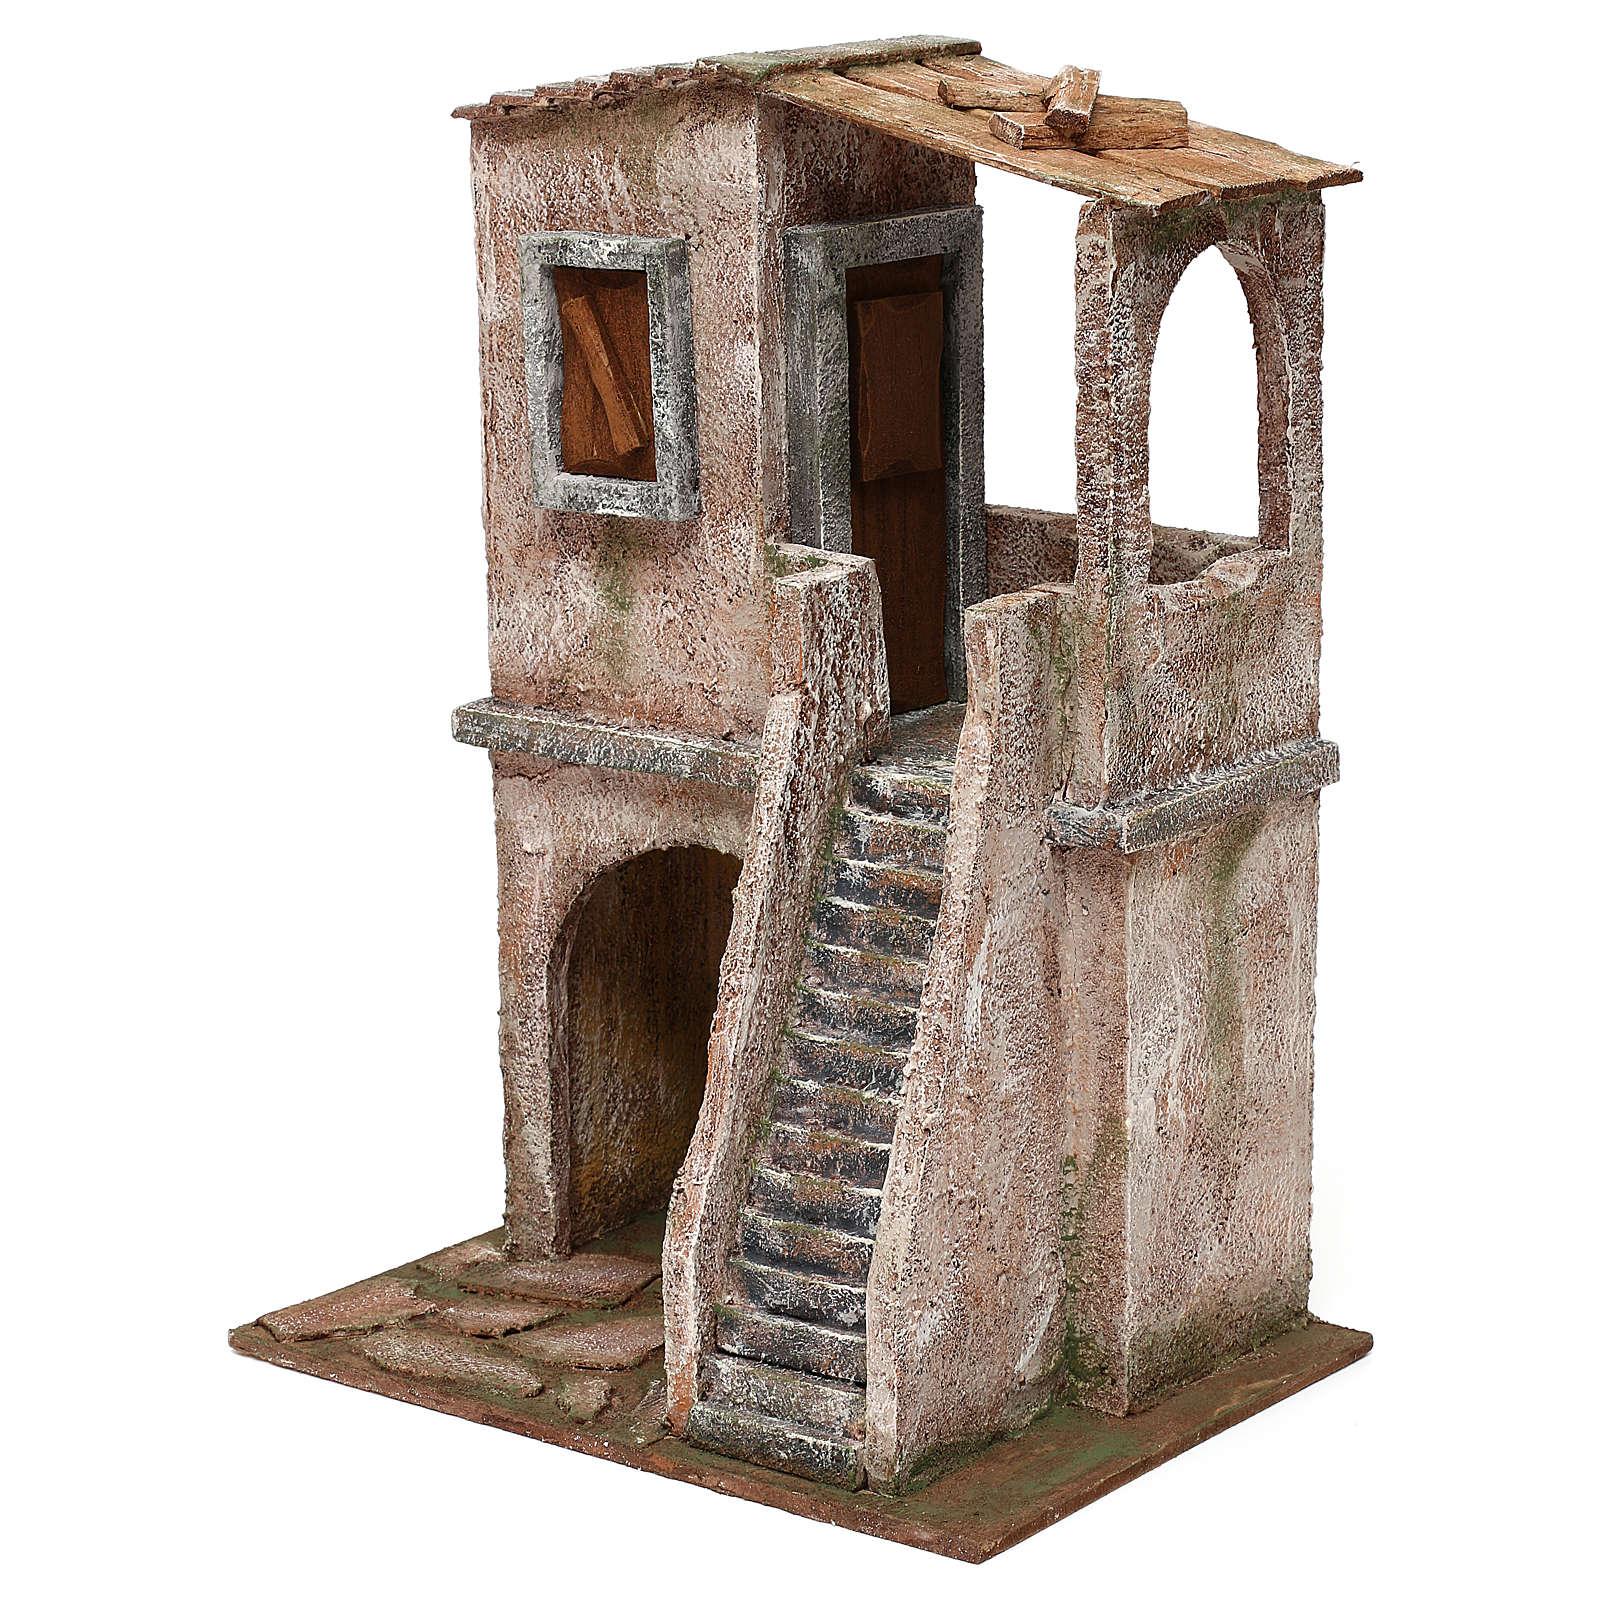 Two-floor house for 12 cm Nativity scene, 34x25x18 cm 4